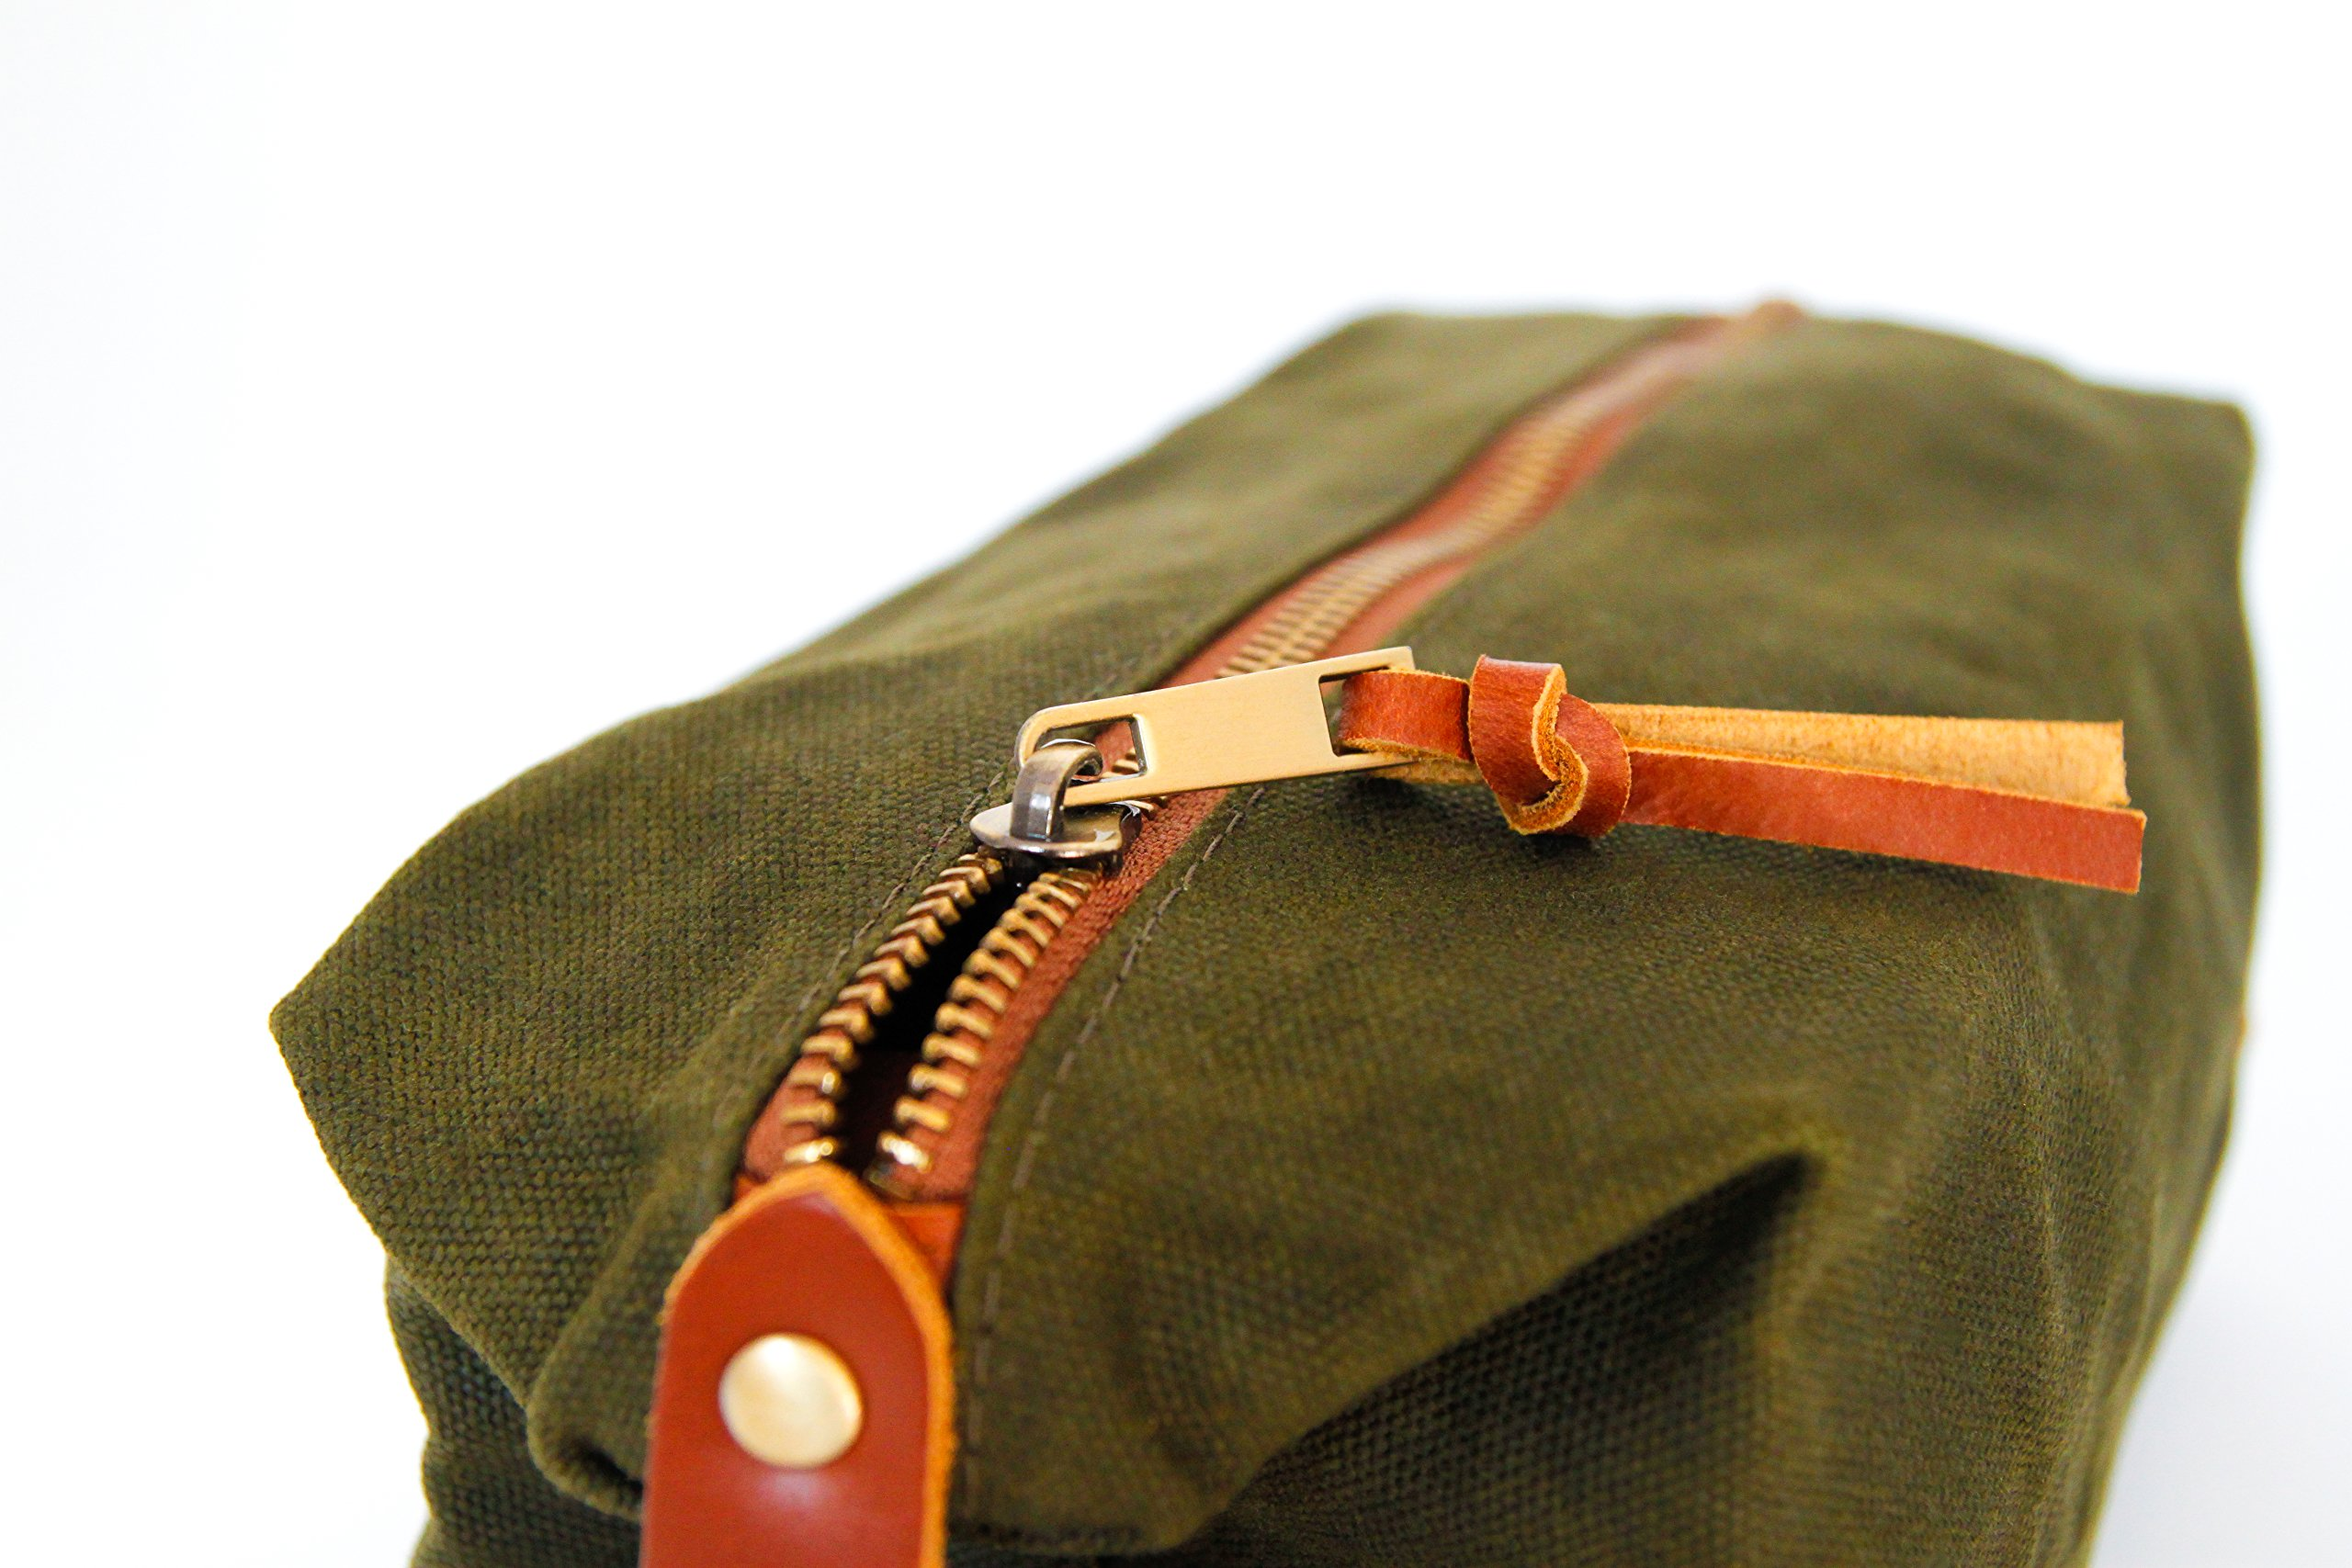 Zaffino Waxed Canvas Genuine Leather Trim Dopp Kit - Unisex Toiletry Bag & Travel Kit by Zaffino (Image #2)